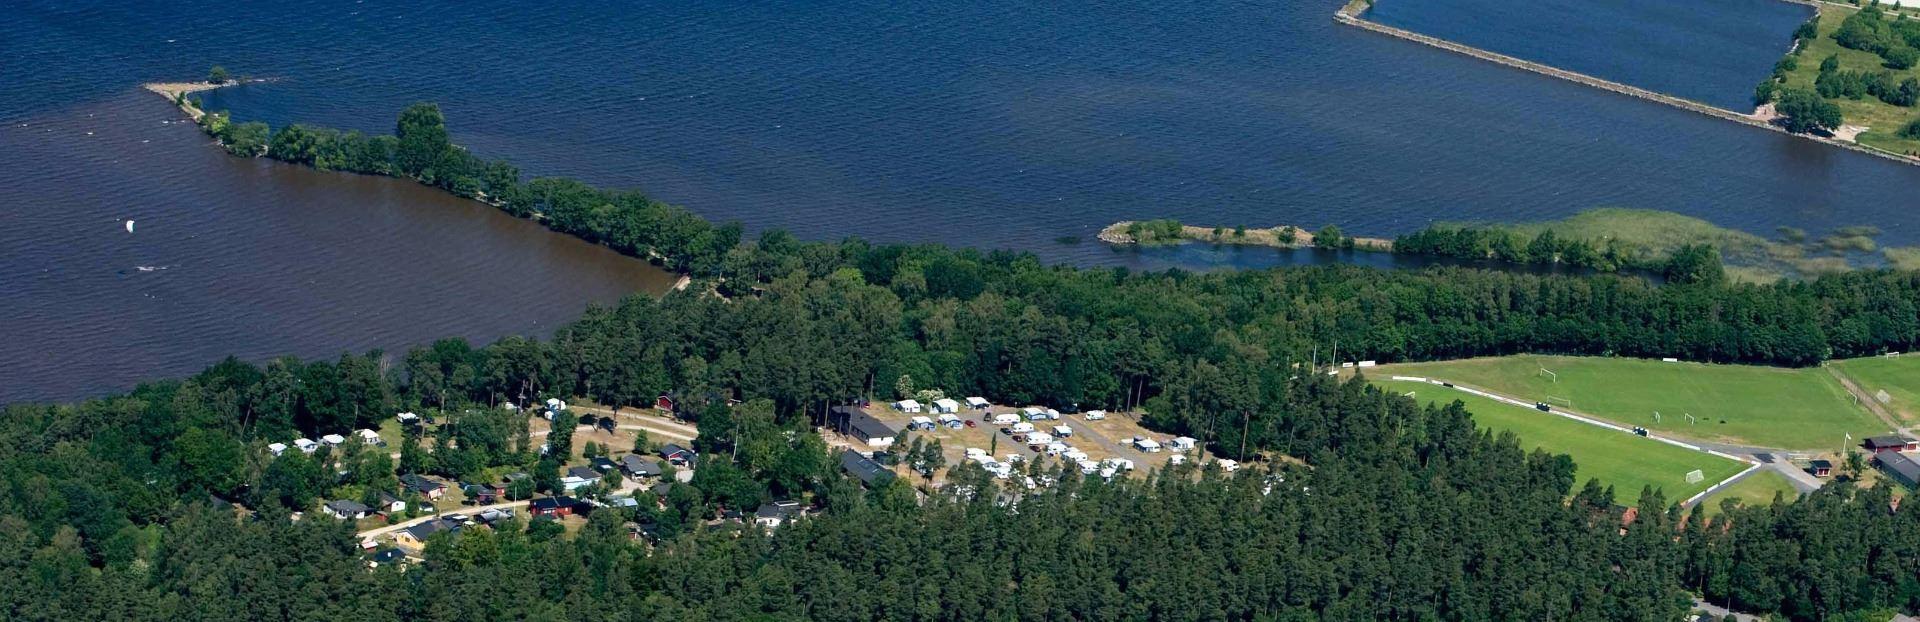 Bromölla Camping & Vandrarhem